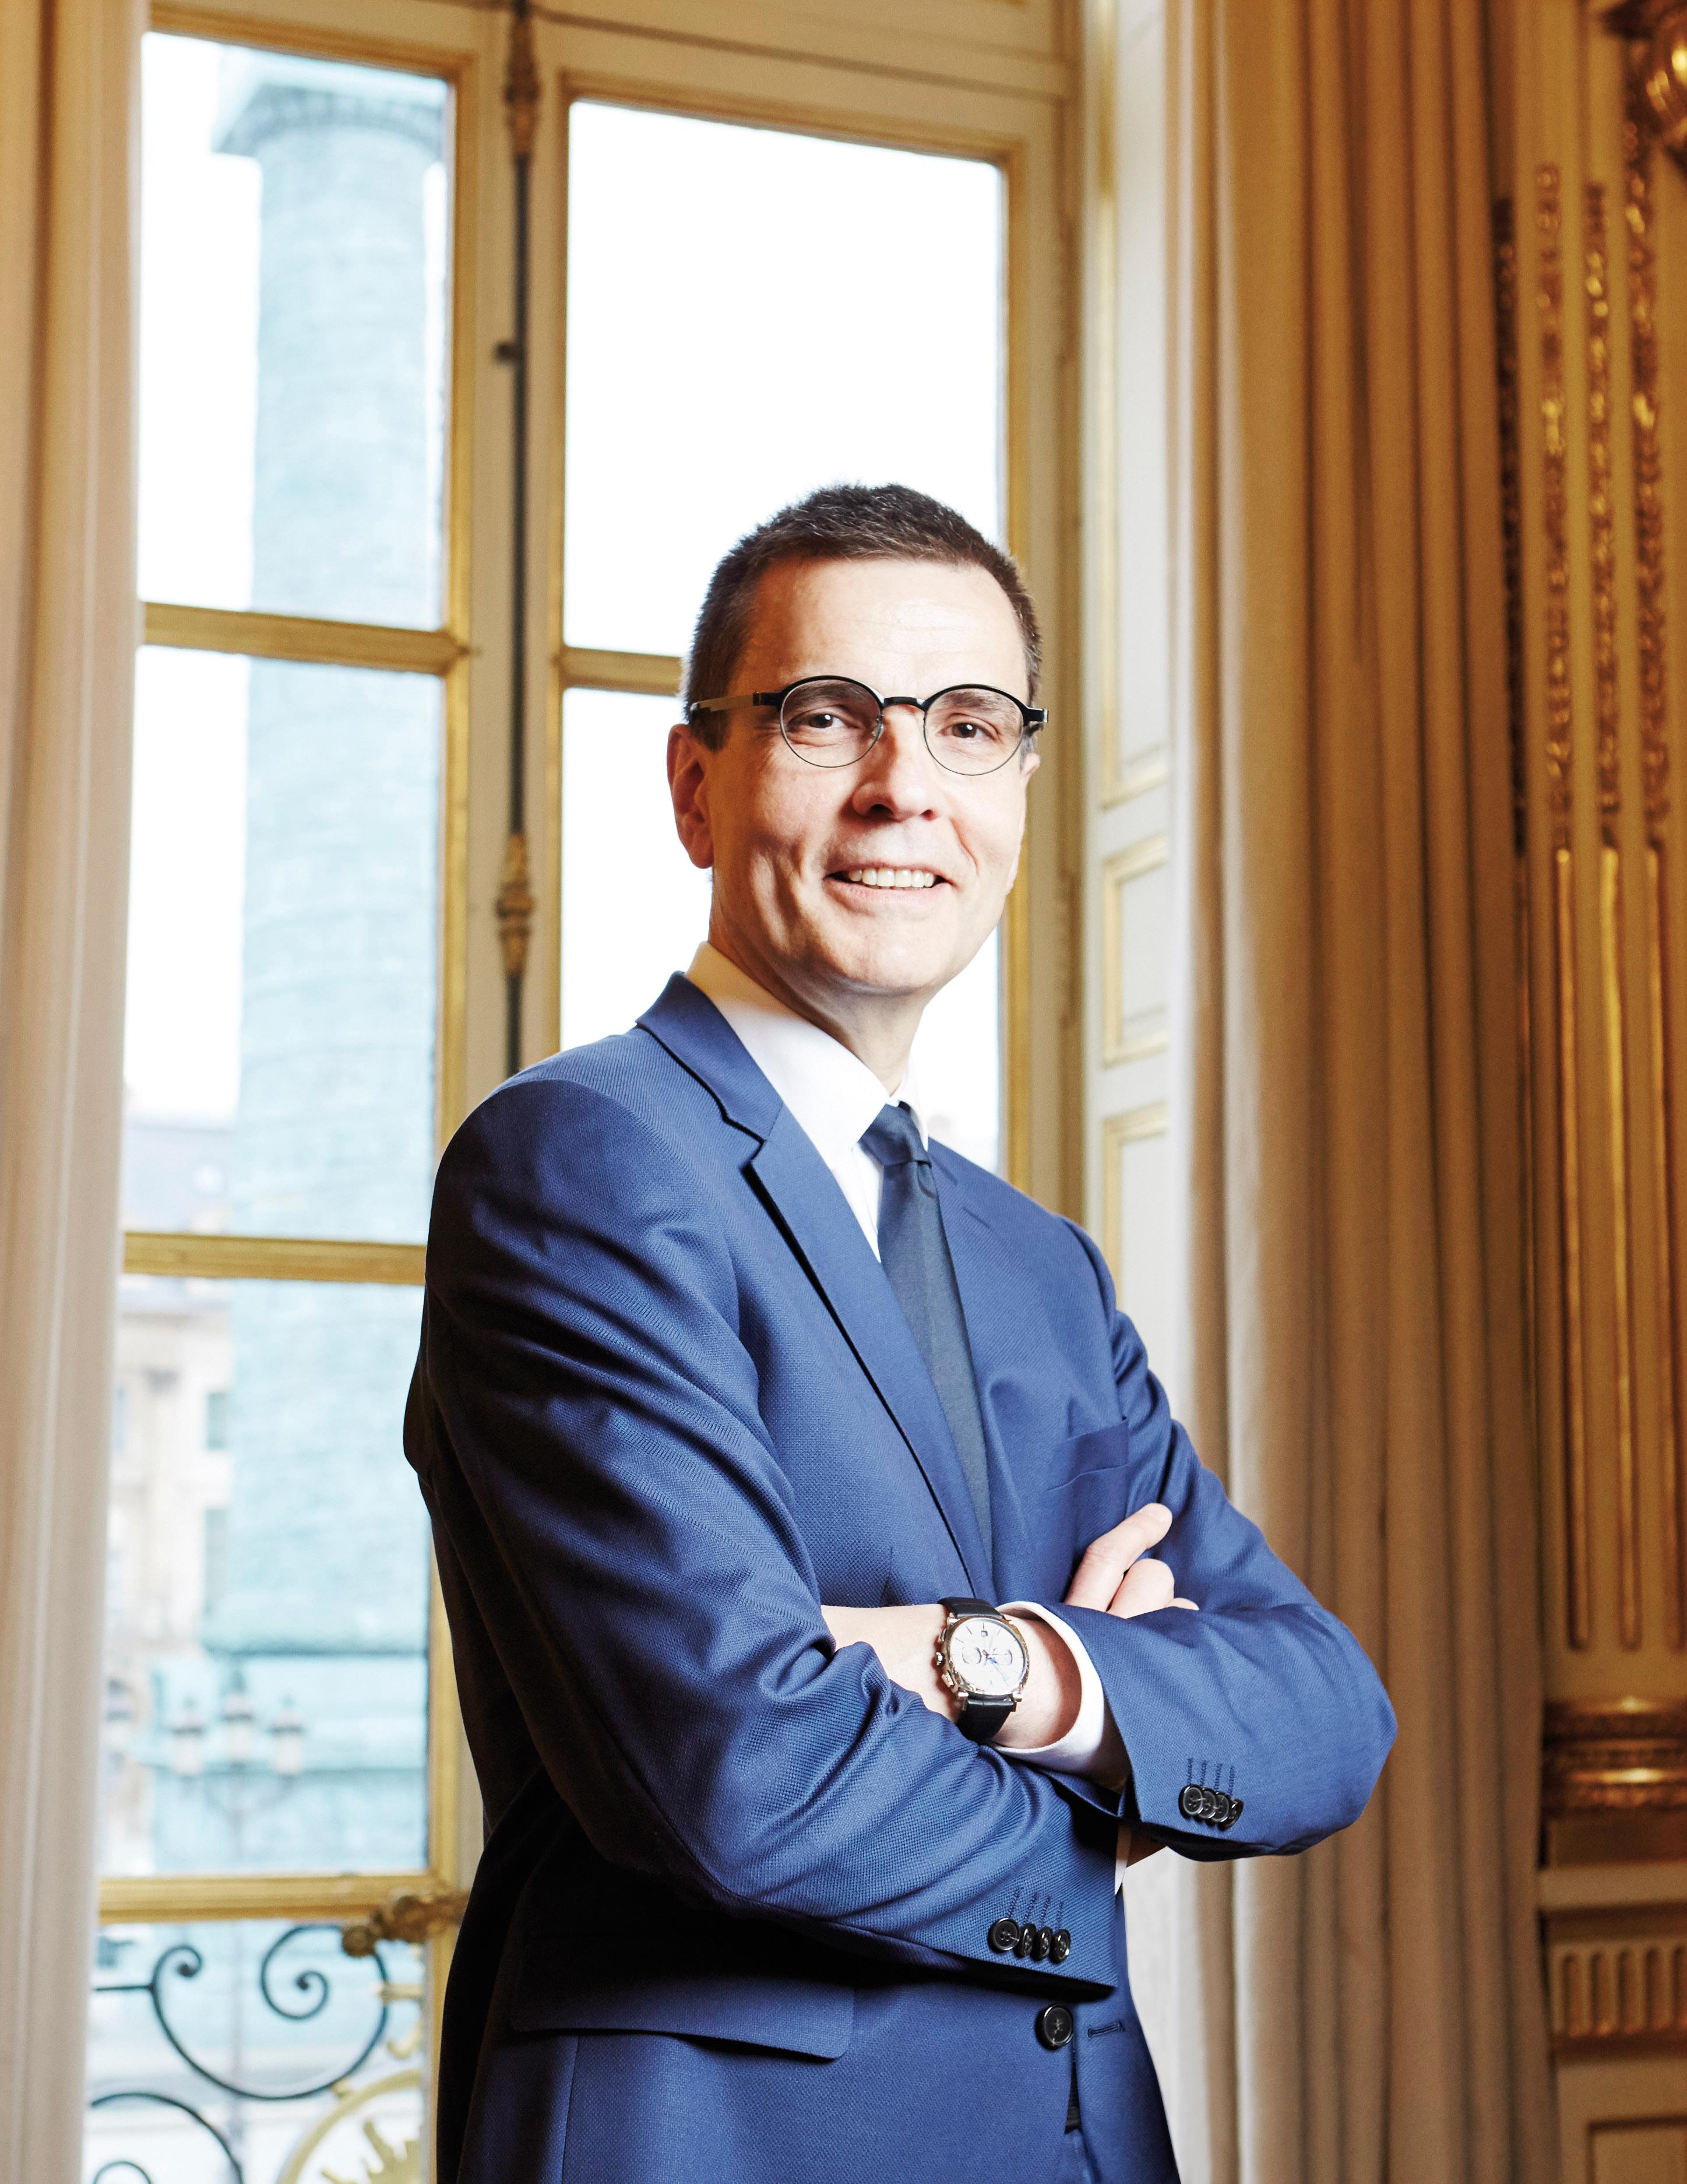 Jean-Marc Mansvelt, CEO of Chaumet